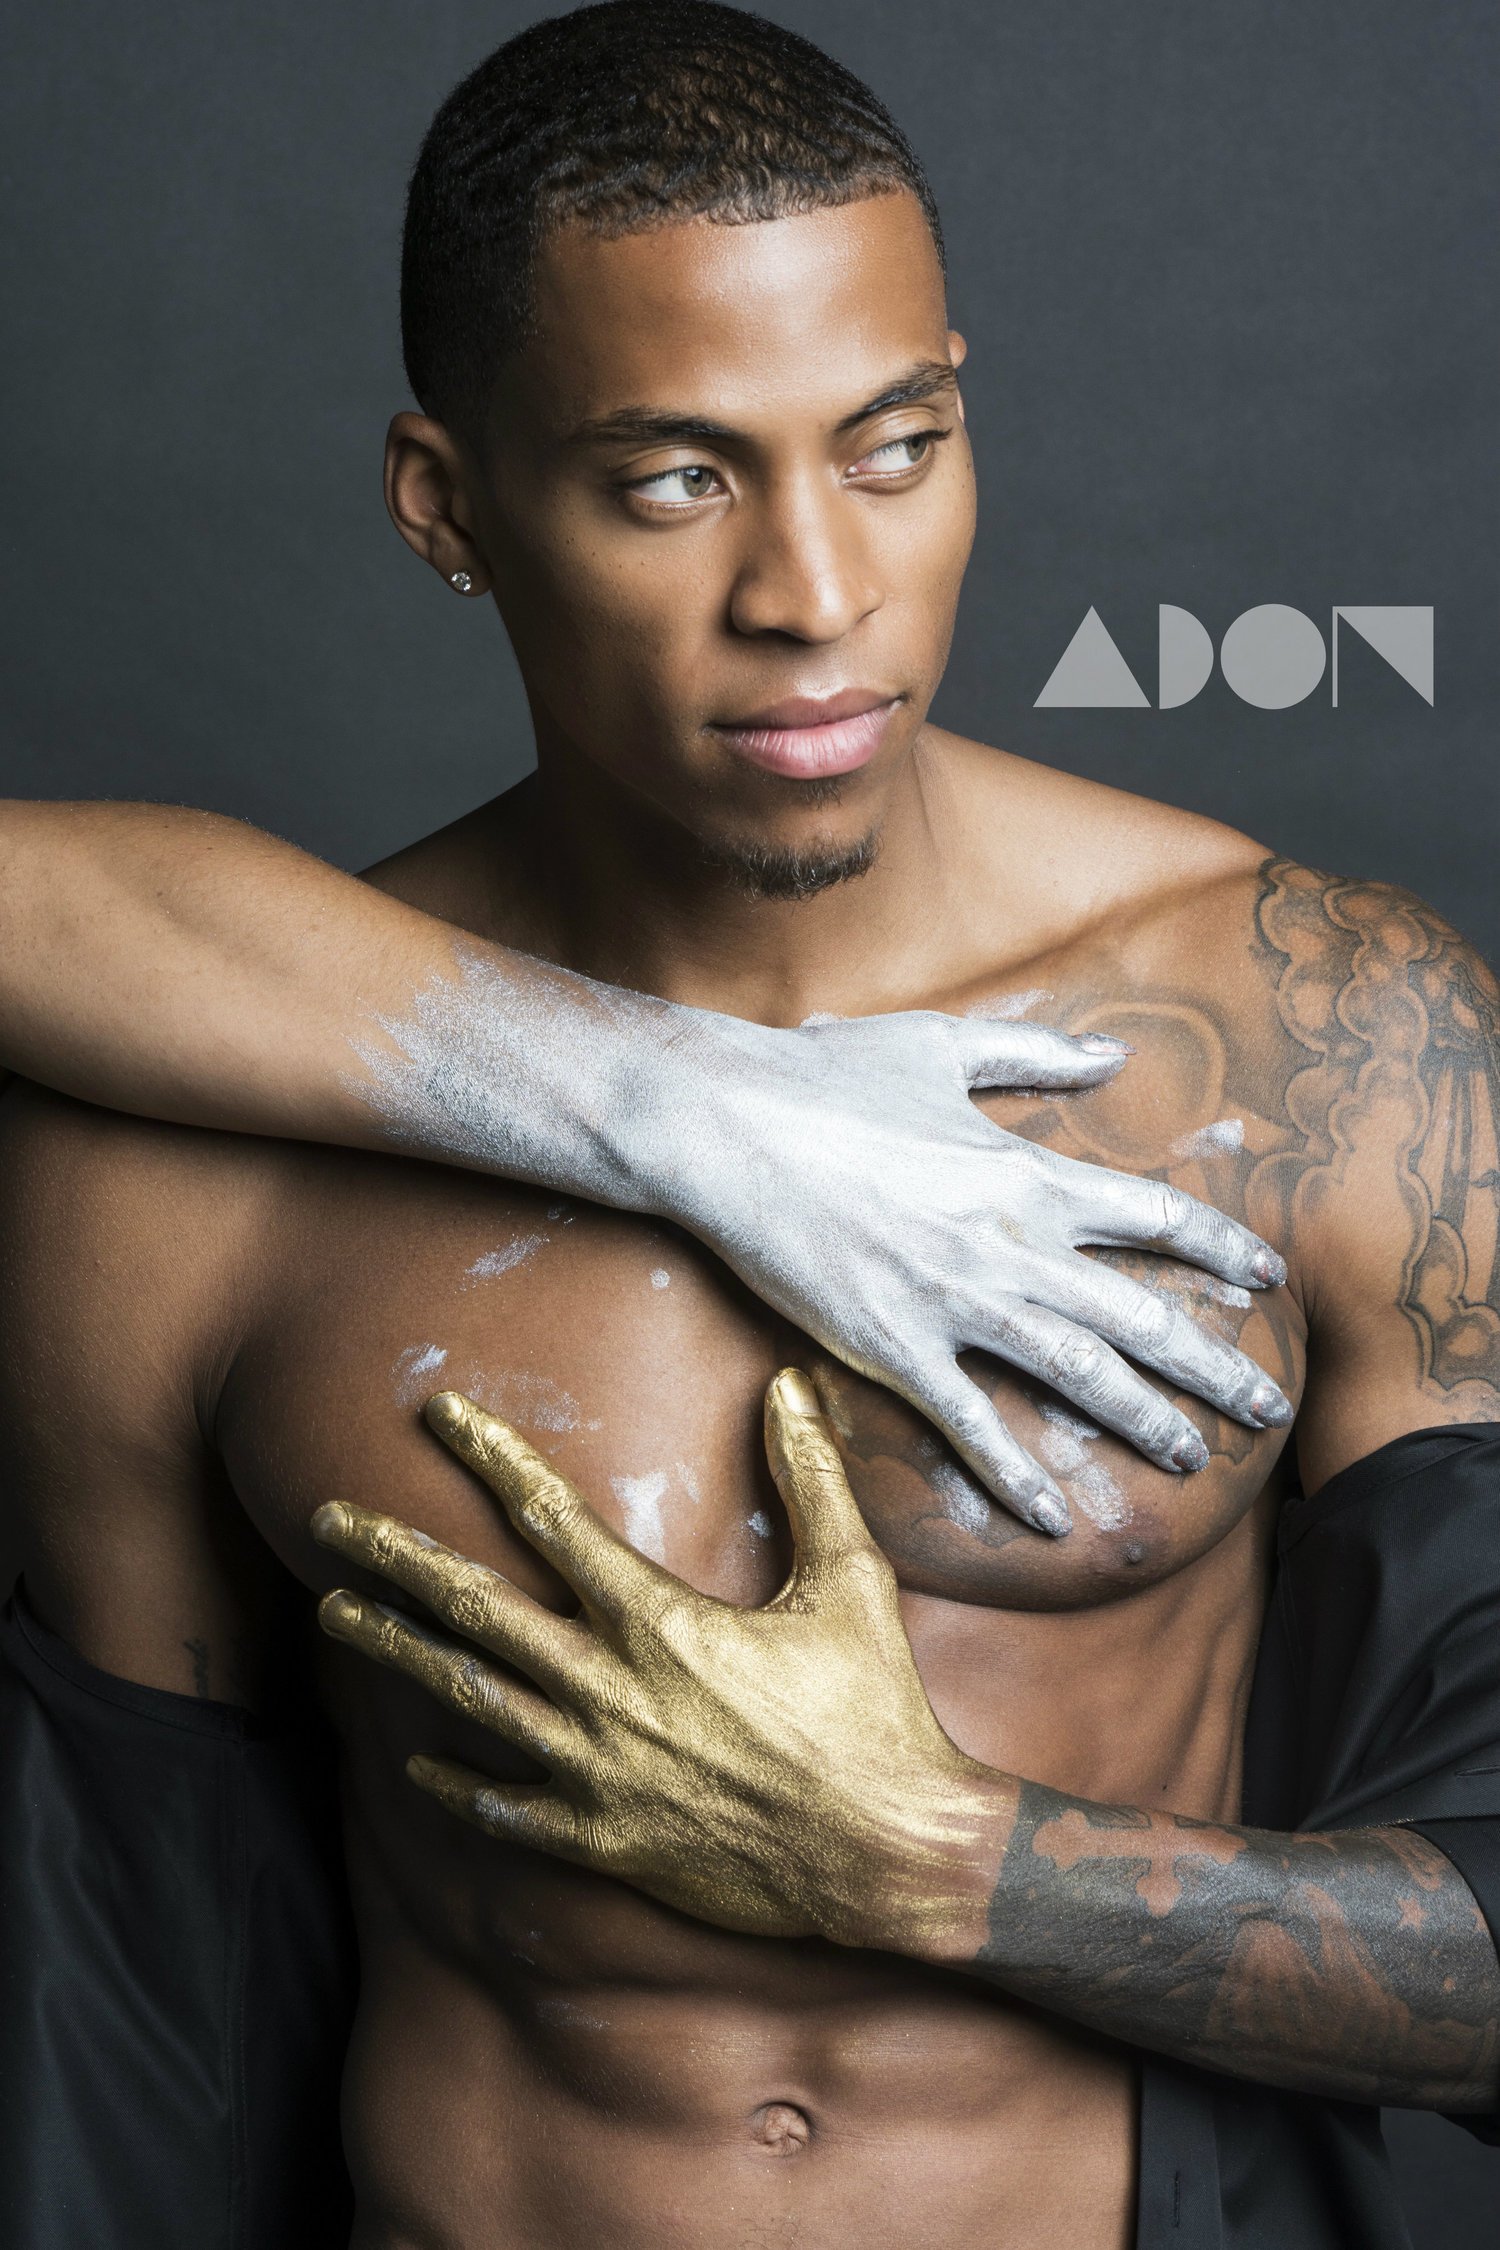 Adon Exclusive: Model Dana Isaiah By Amanda Ramón